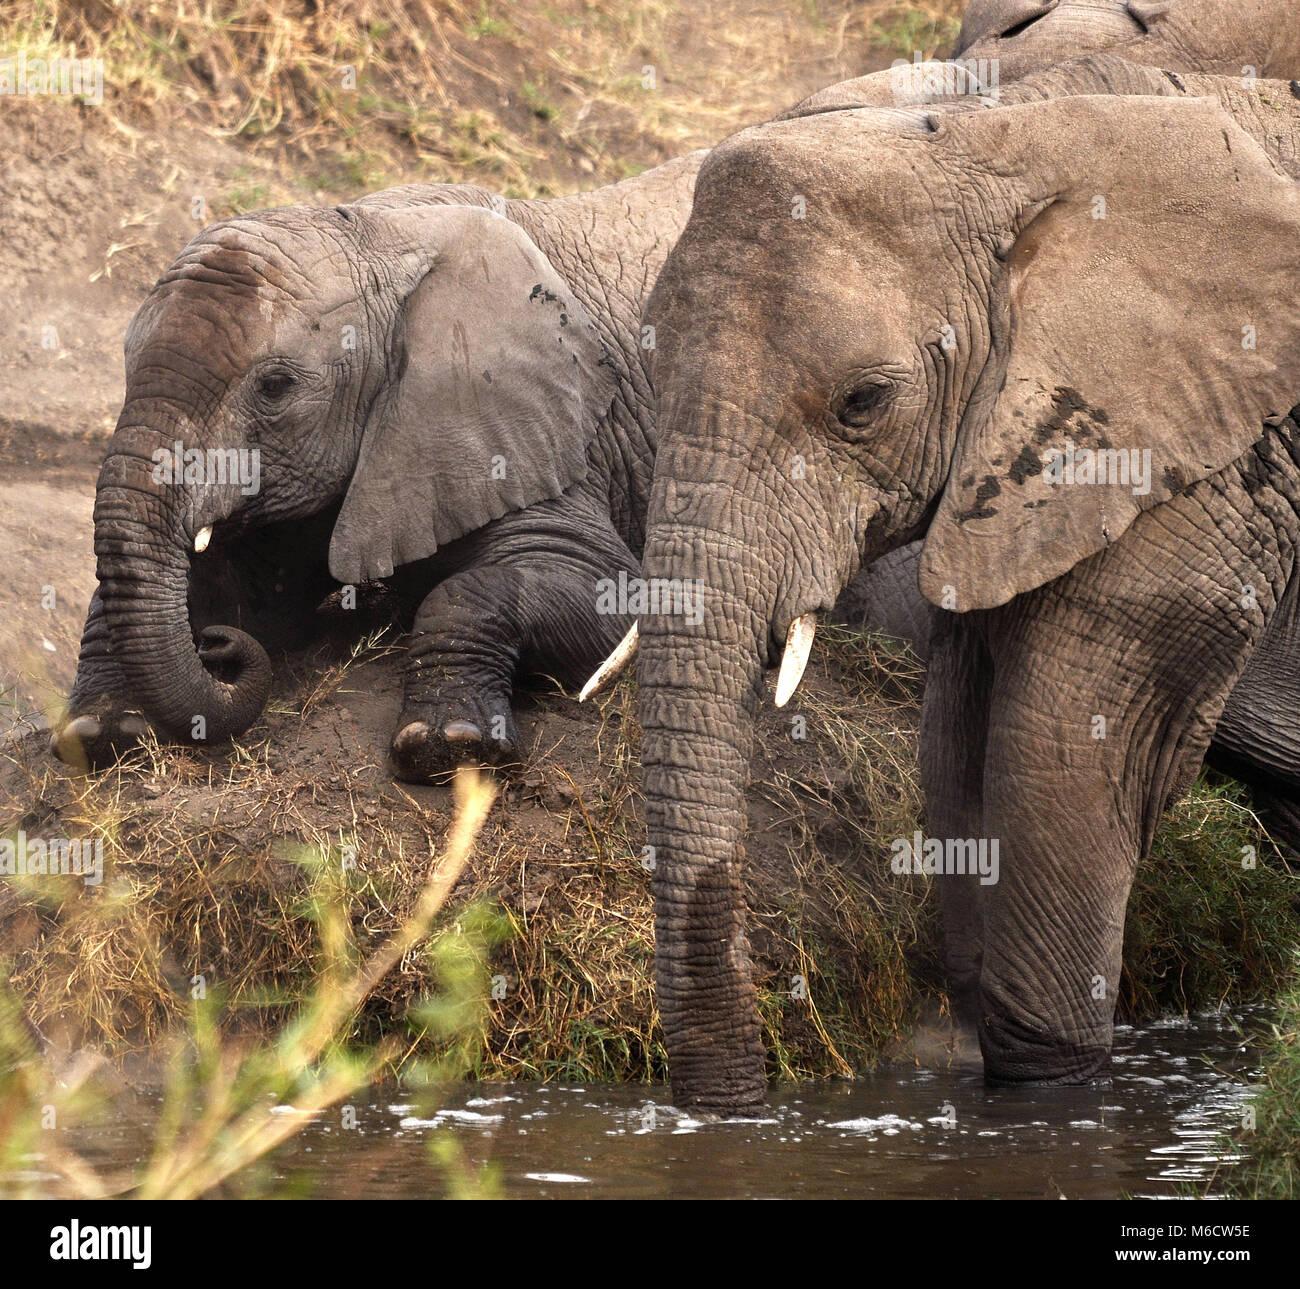 Mother and baby bush Elephants (Loxodonta africana). Serengeti National Park, Tanzania. - Stock Image